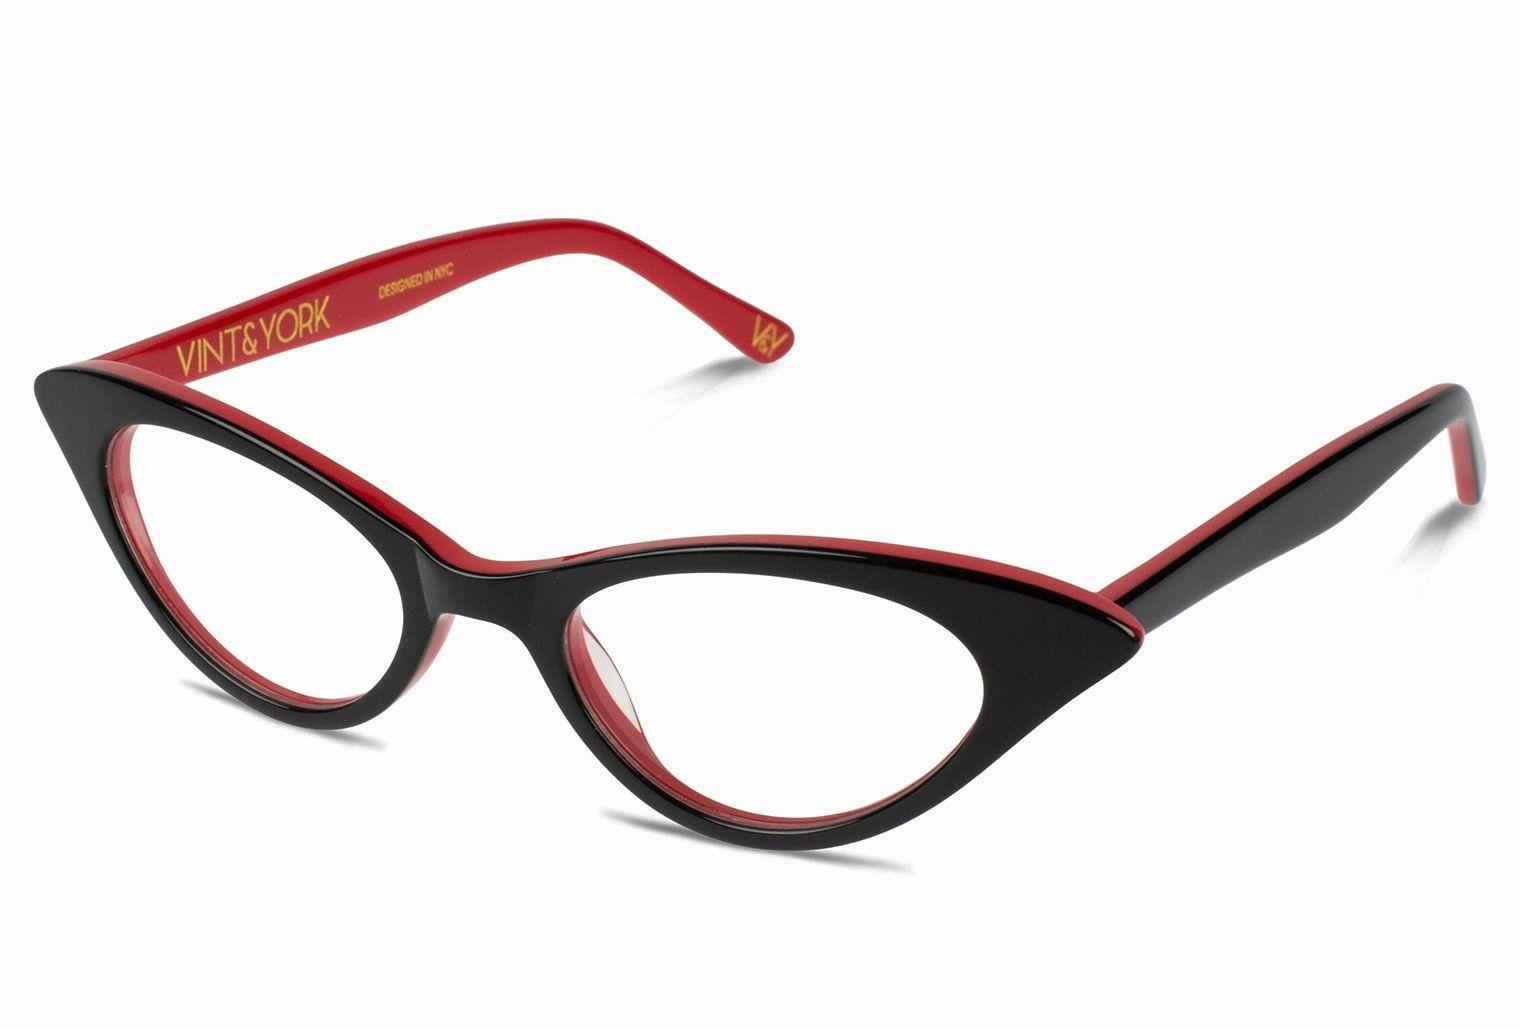 dd3a1a2ddf9 CATS MEOW Cat-Eye Glasses Frame In Black For Women - Vint   York Eyewear